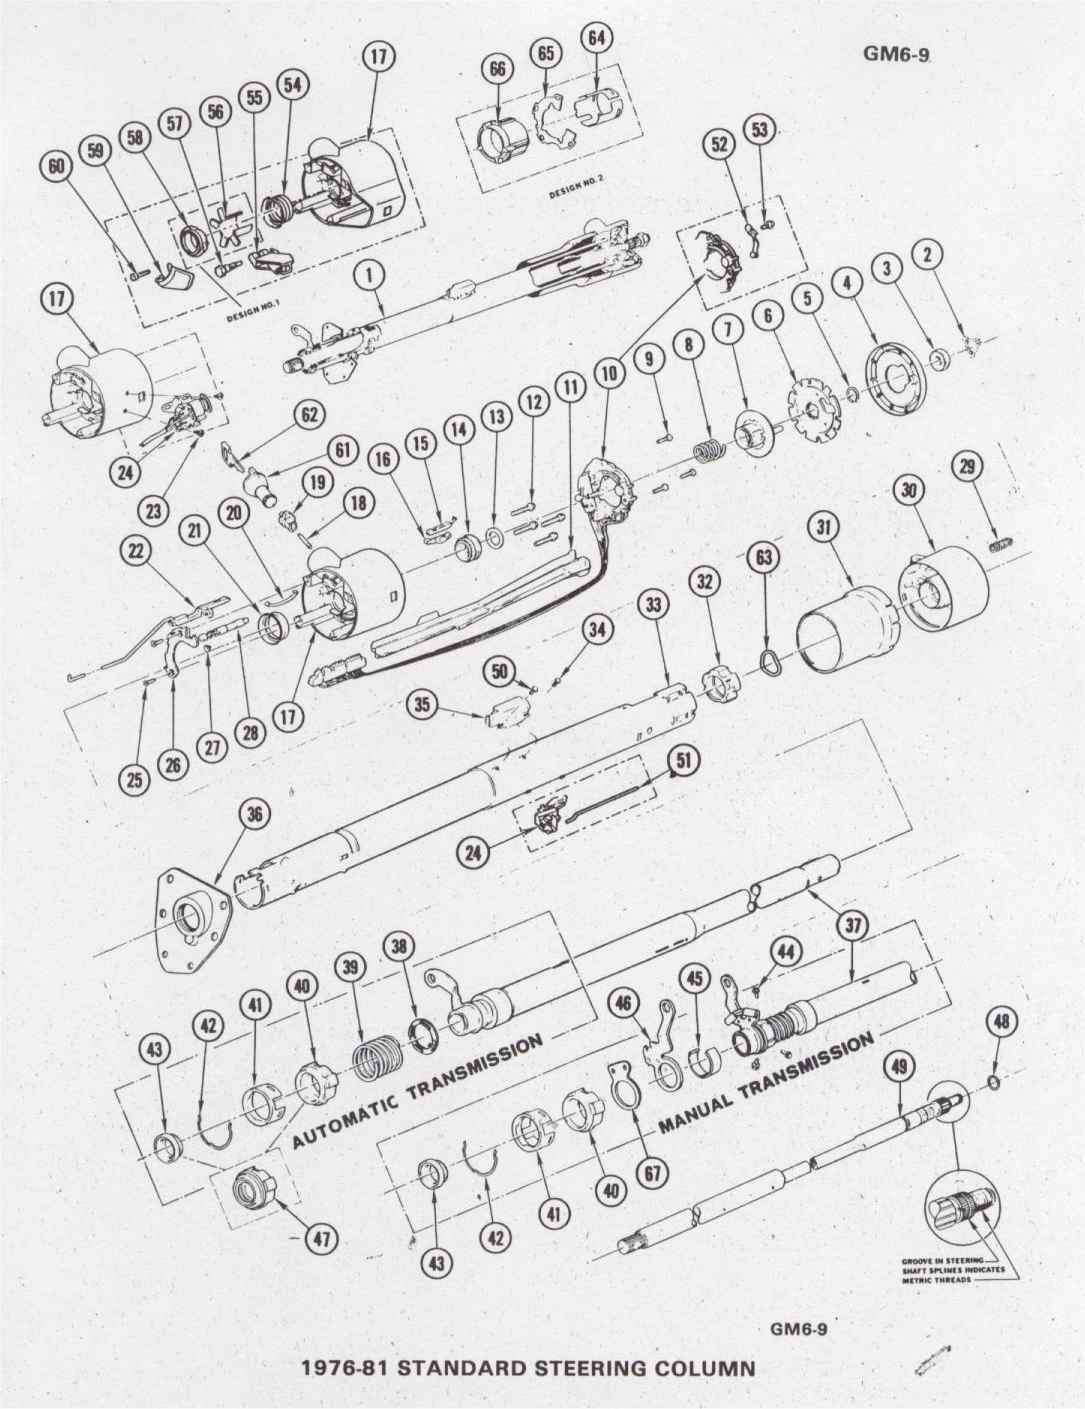 Diagram 1968 Camaro Steering Wheel Assembly Diagram Full Version Hd Quality Assembly Diagram Shock One Weblula It